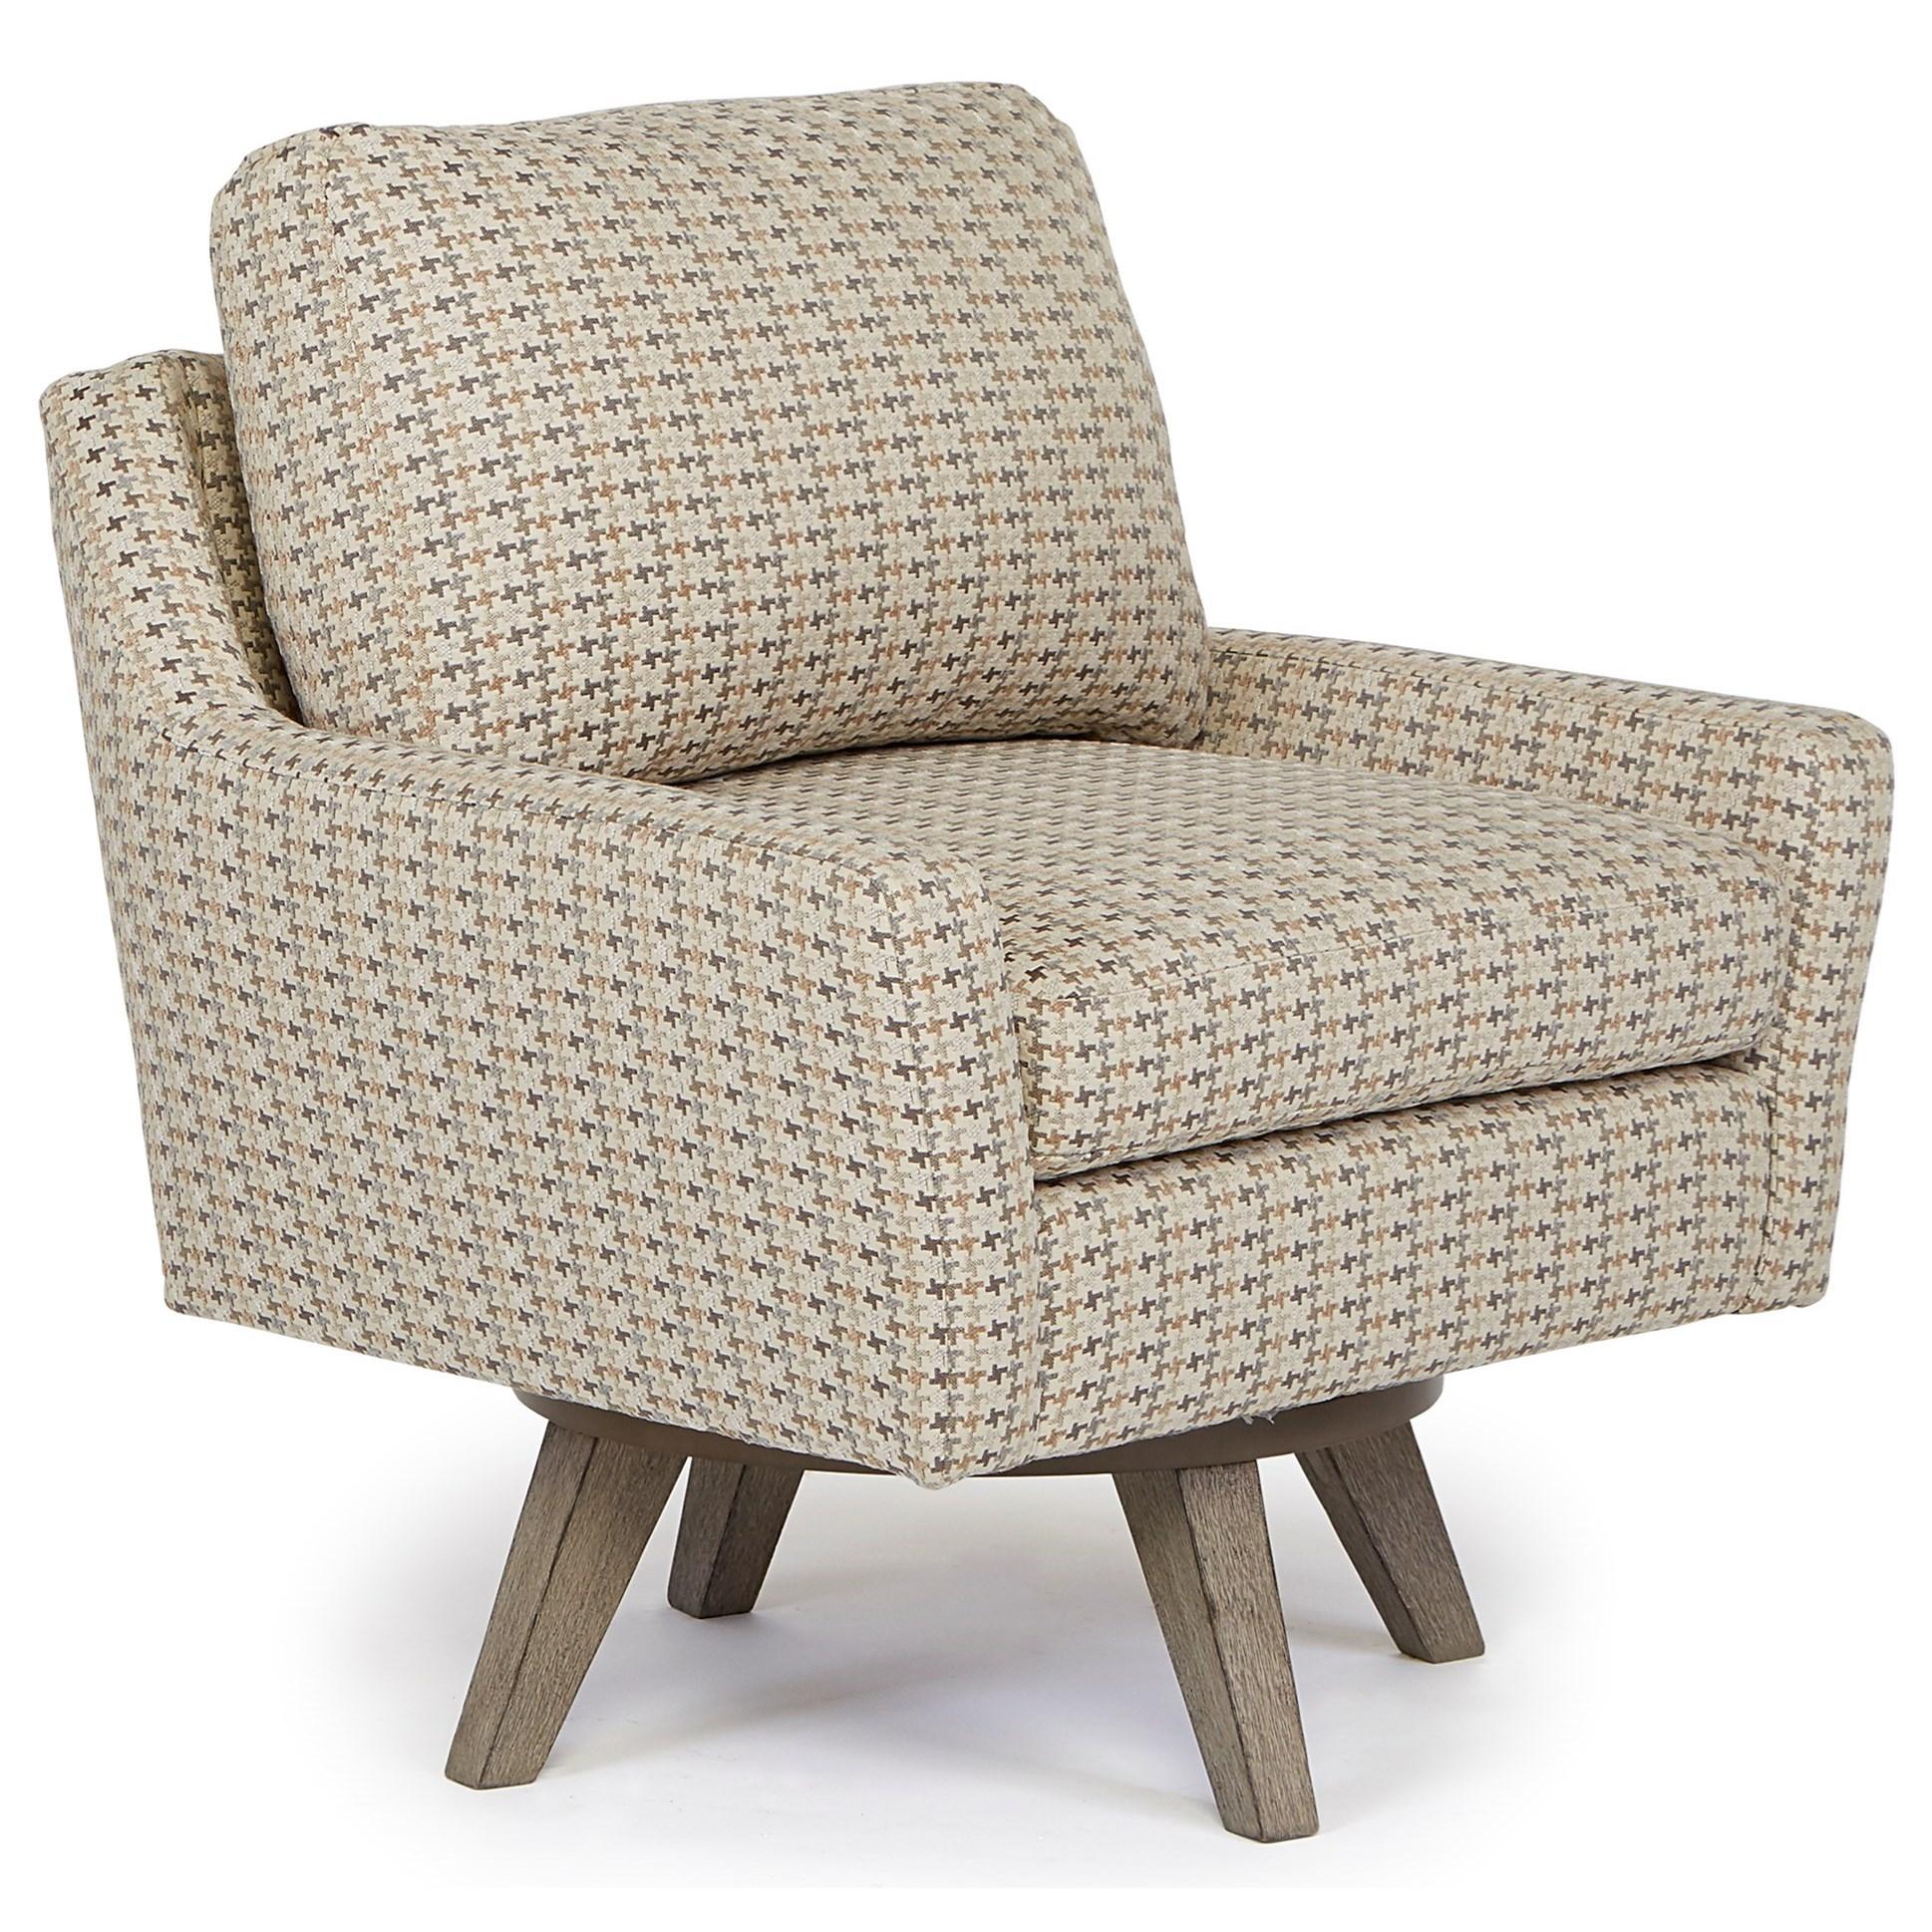 Best Home Furnishings Chairs Swivel Barrel 2508 Seymour